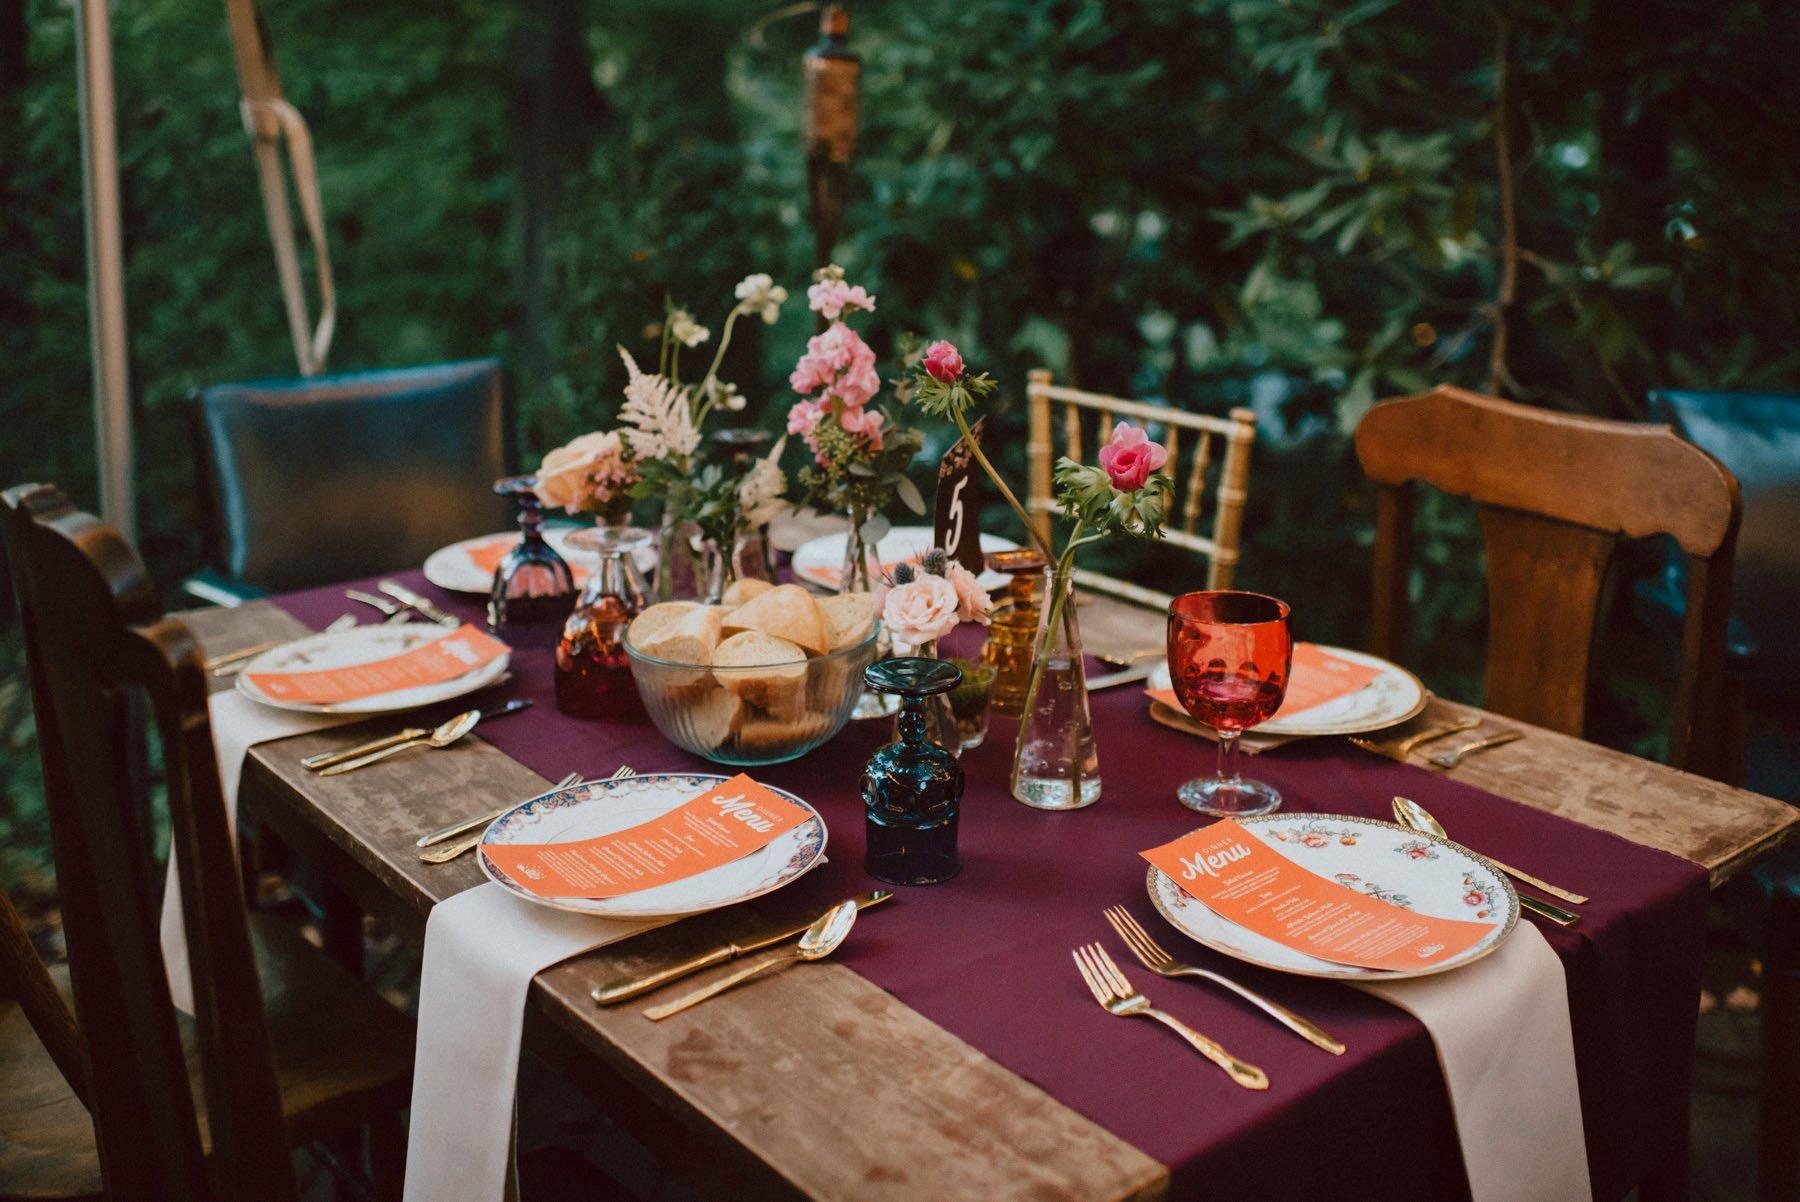 faunbrook-bed-and-breakfast-wedding-136.jpg